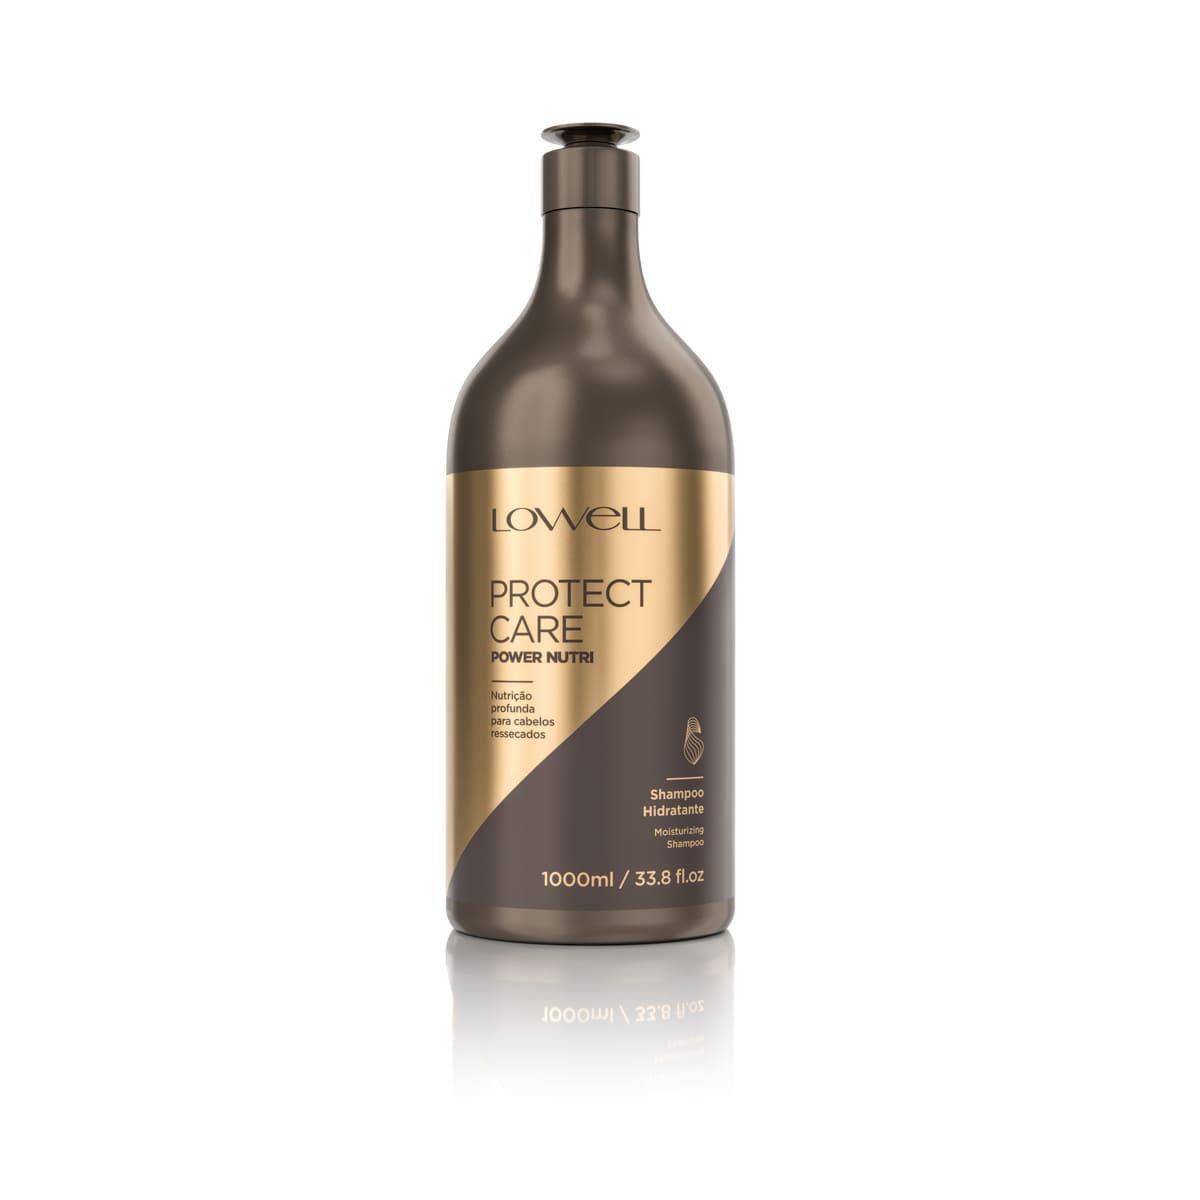 Shampoo Protect Care Power Nutri 1000ml